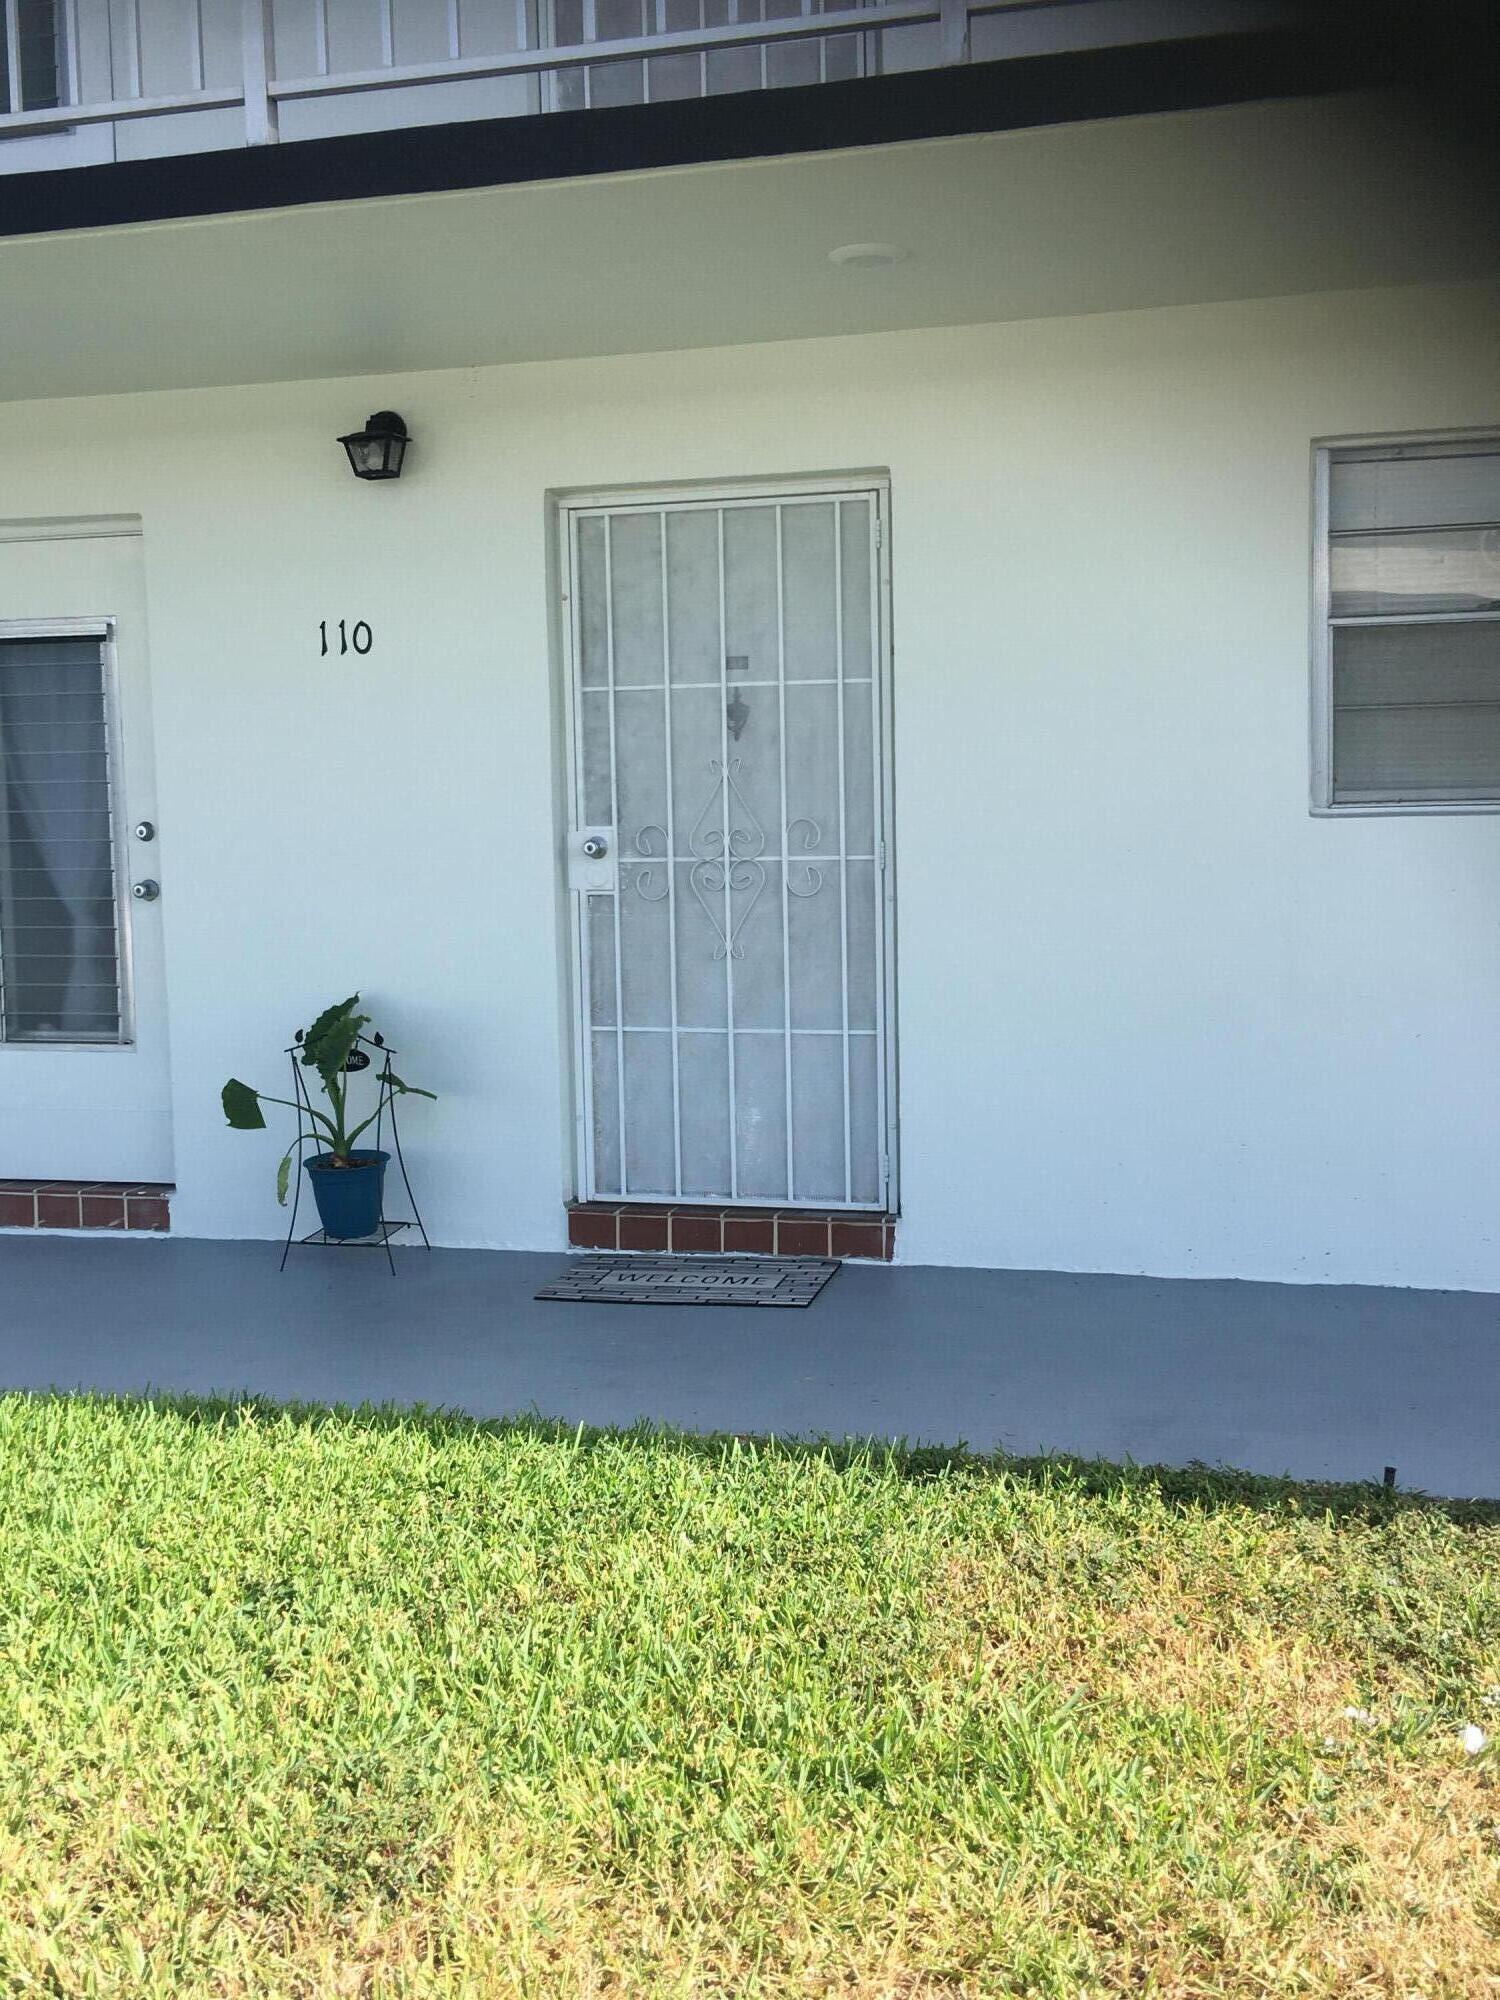 1113 Lake Terrace 110 Boynton Beach, FL 33426